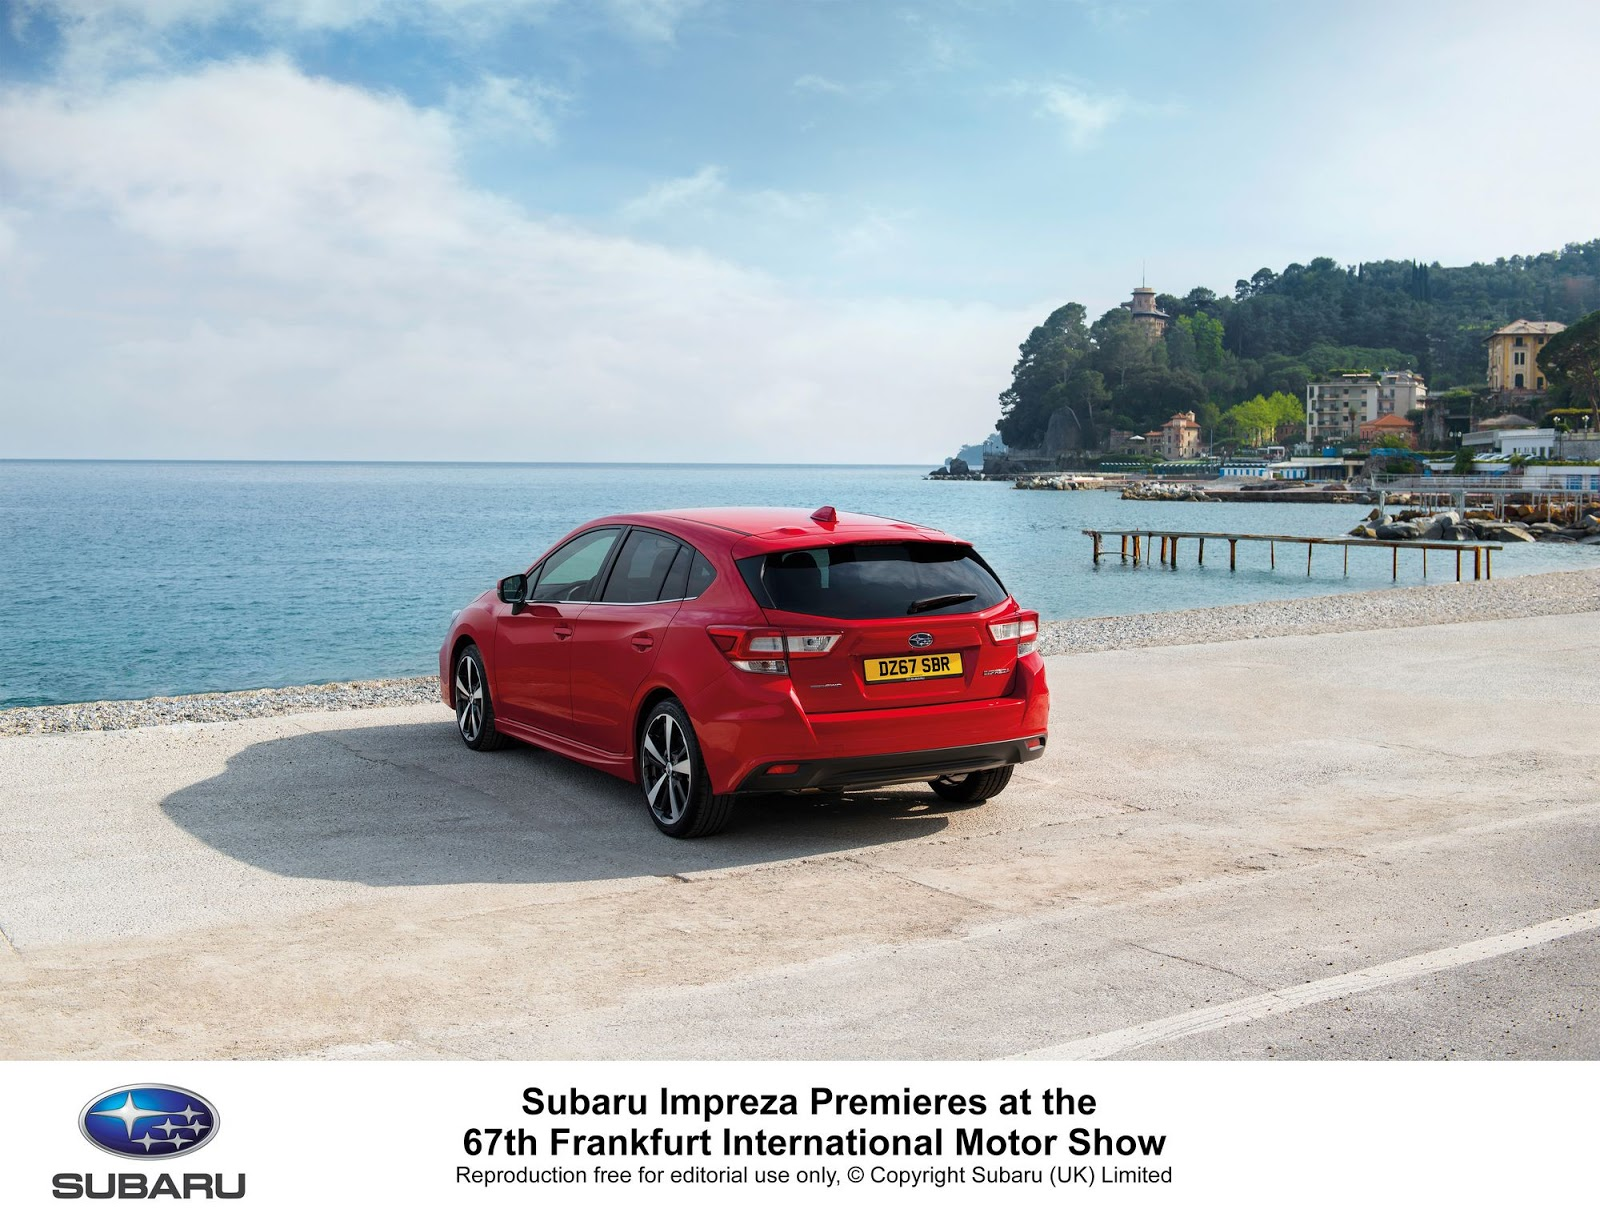 2018-Subaru-Impreza-5